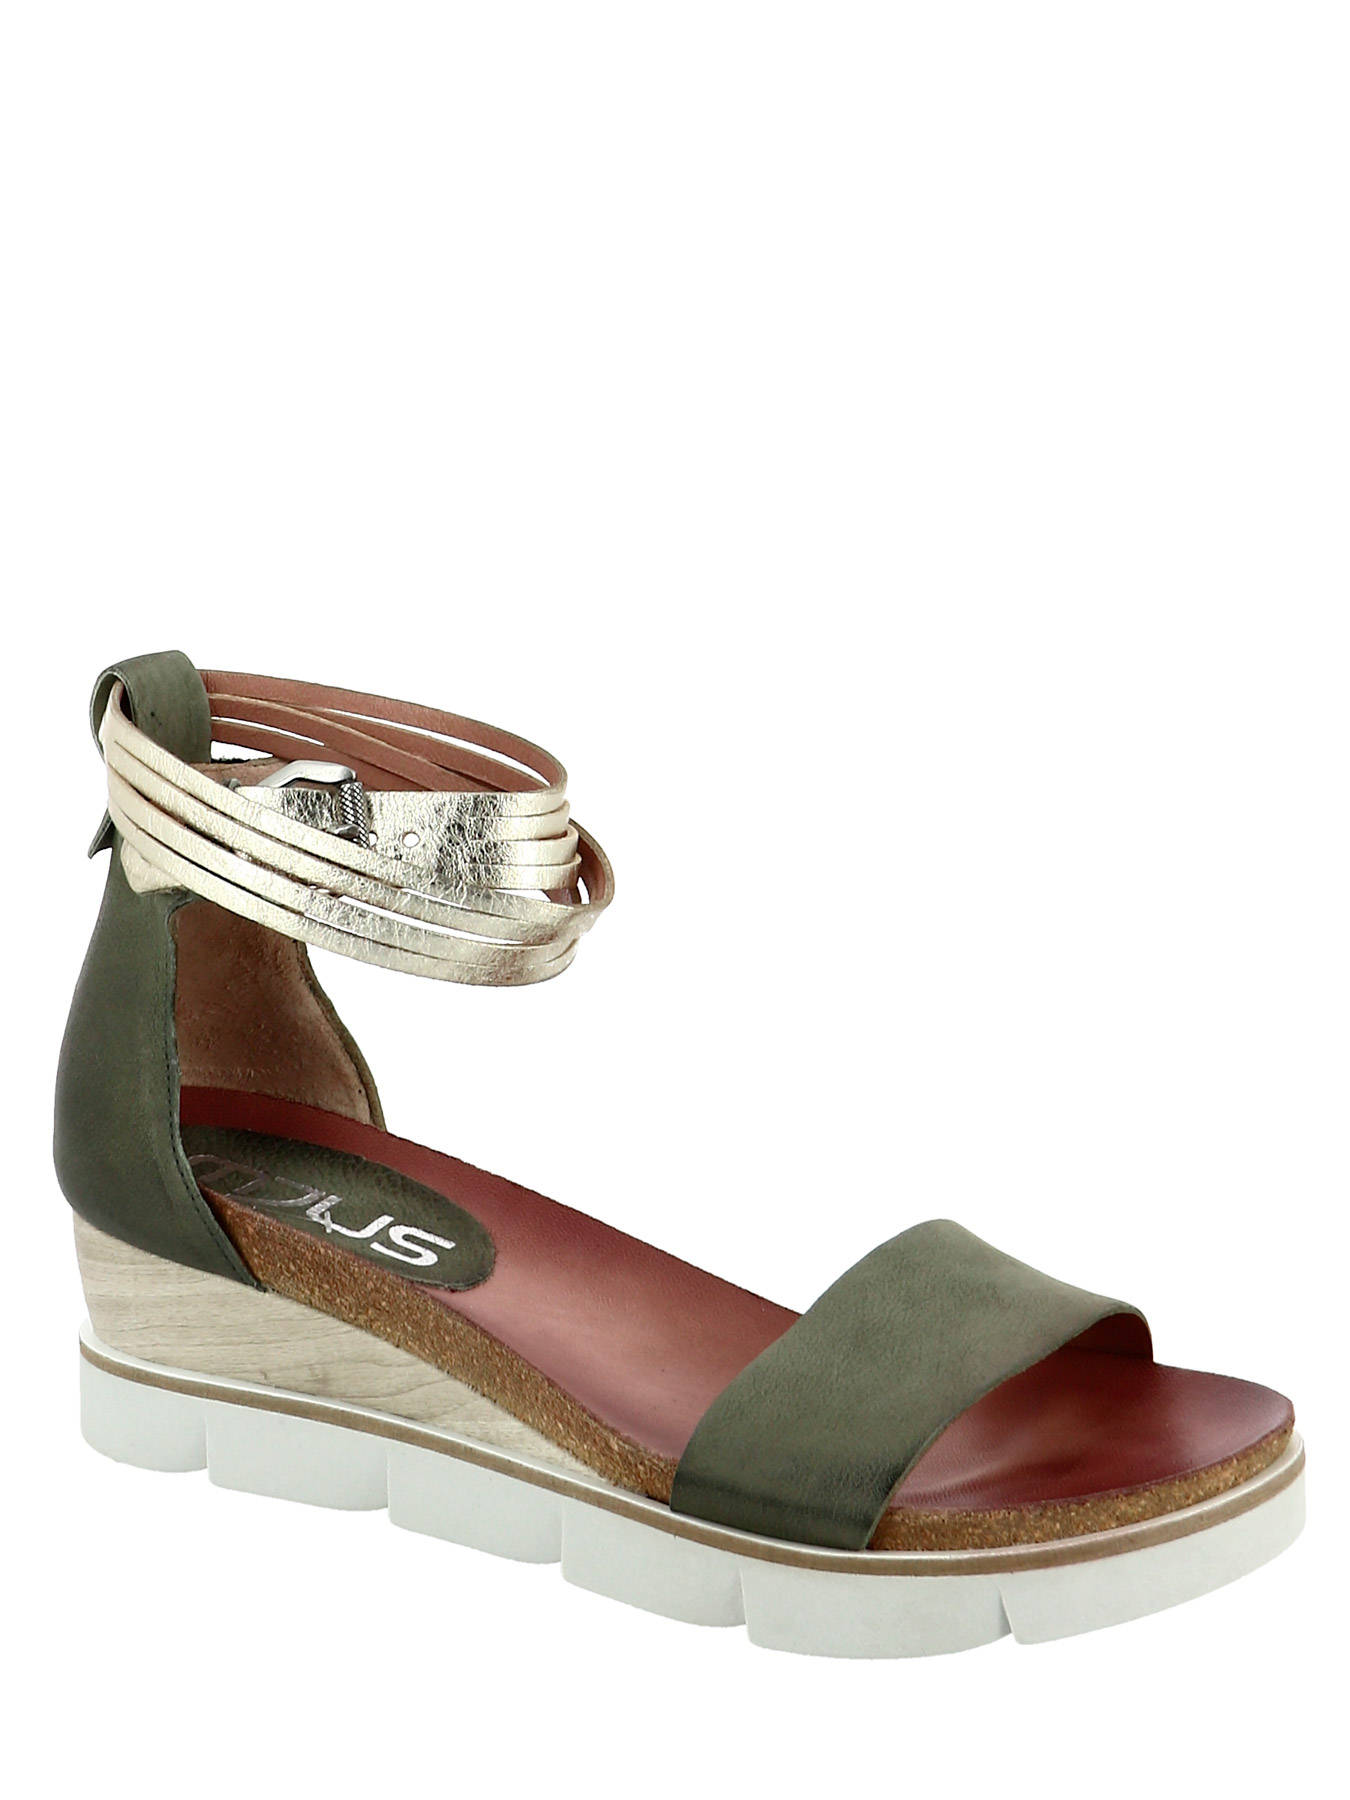 ad70bd892ff6 Mjus Sandals flip-flops 866005 - best prices